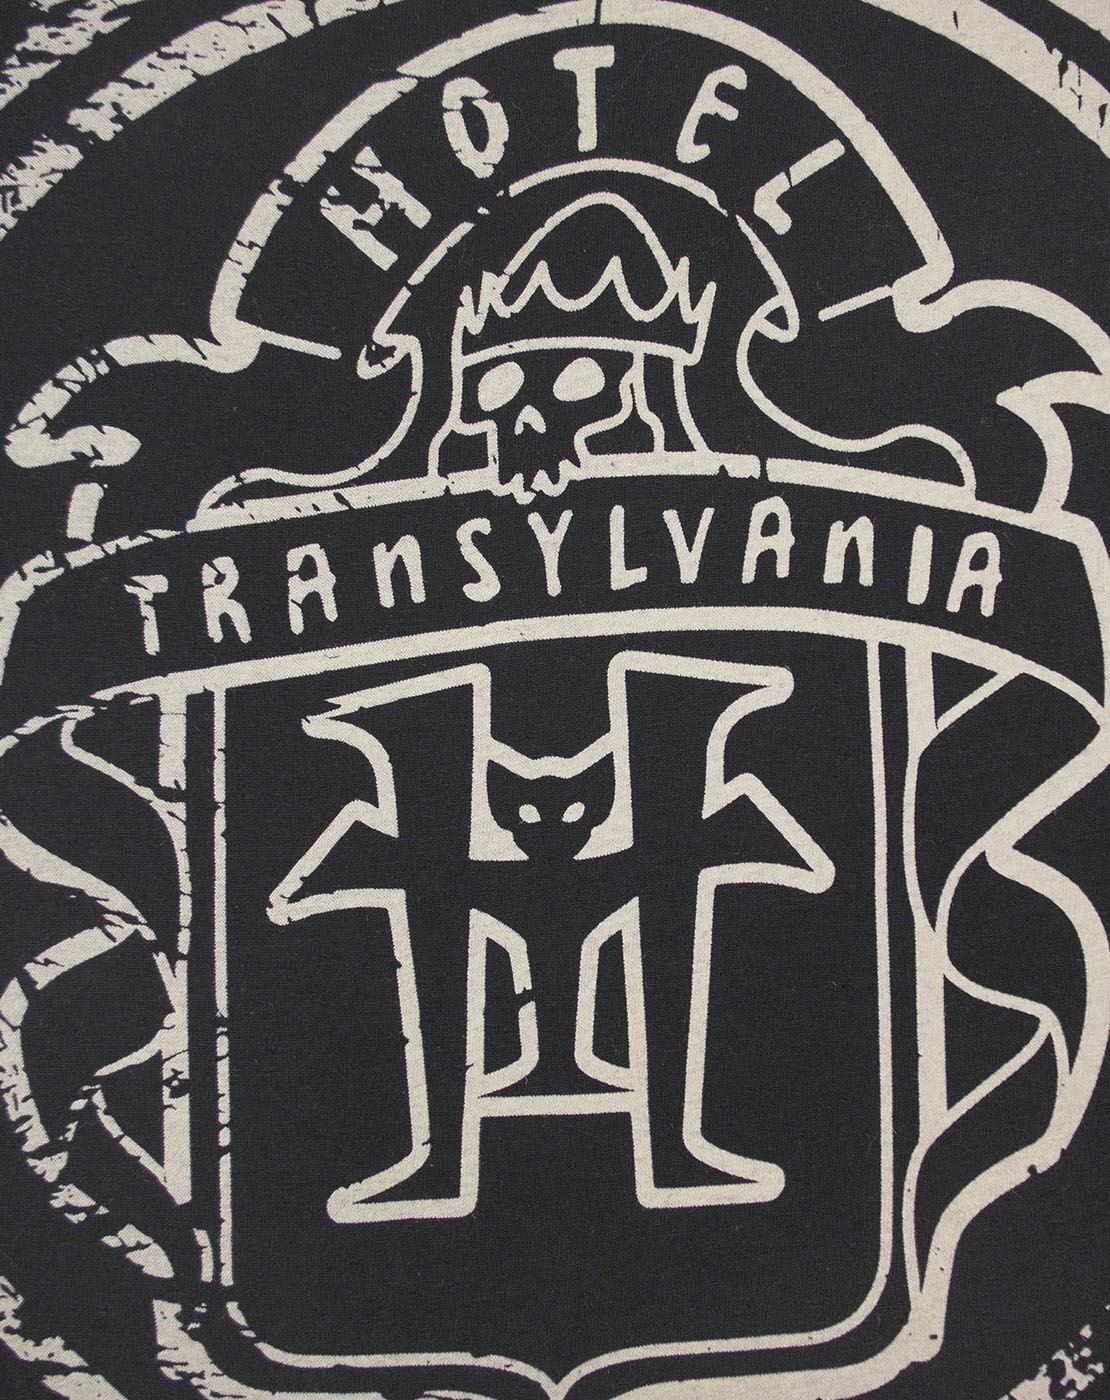 thumbnail 9 - Hotel-Transylvania-Logo-Glow-In-The-Dark-Women-039-s-T-Shirt